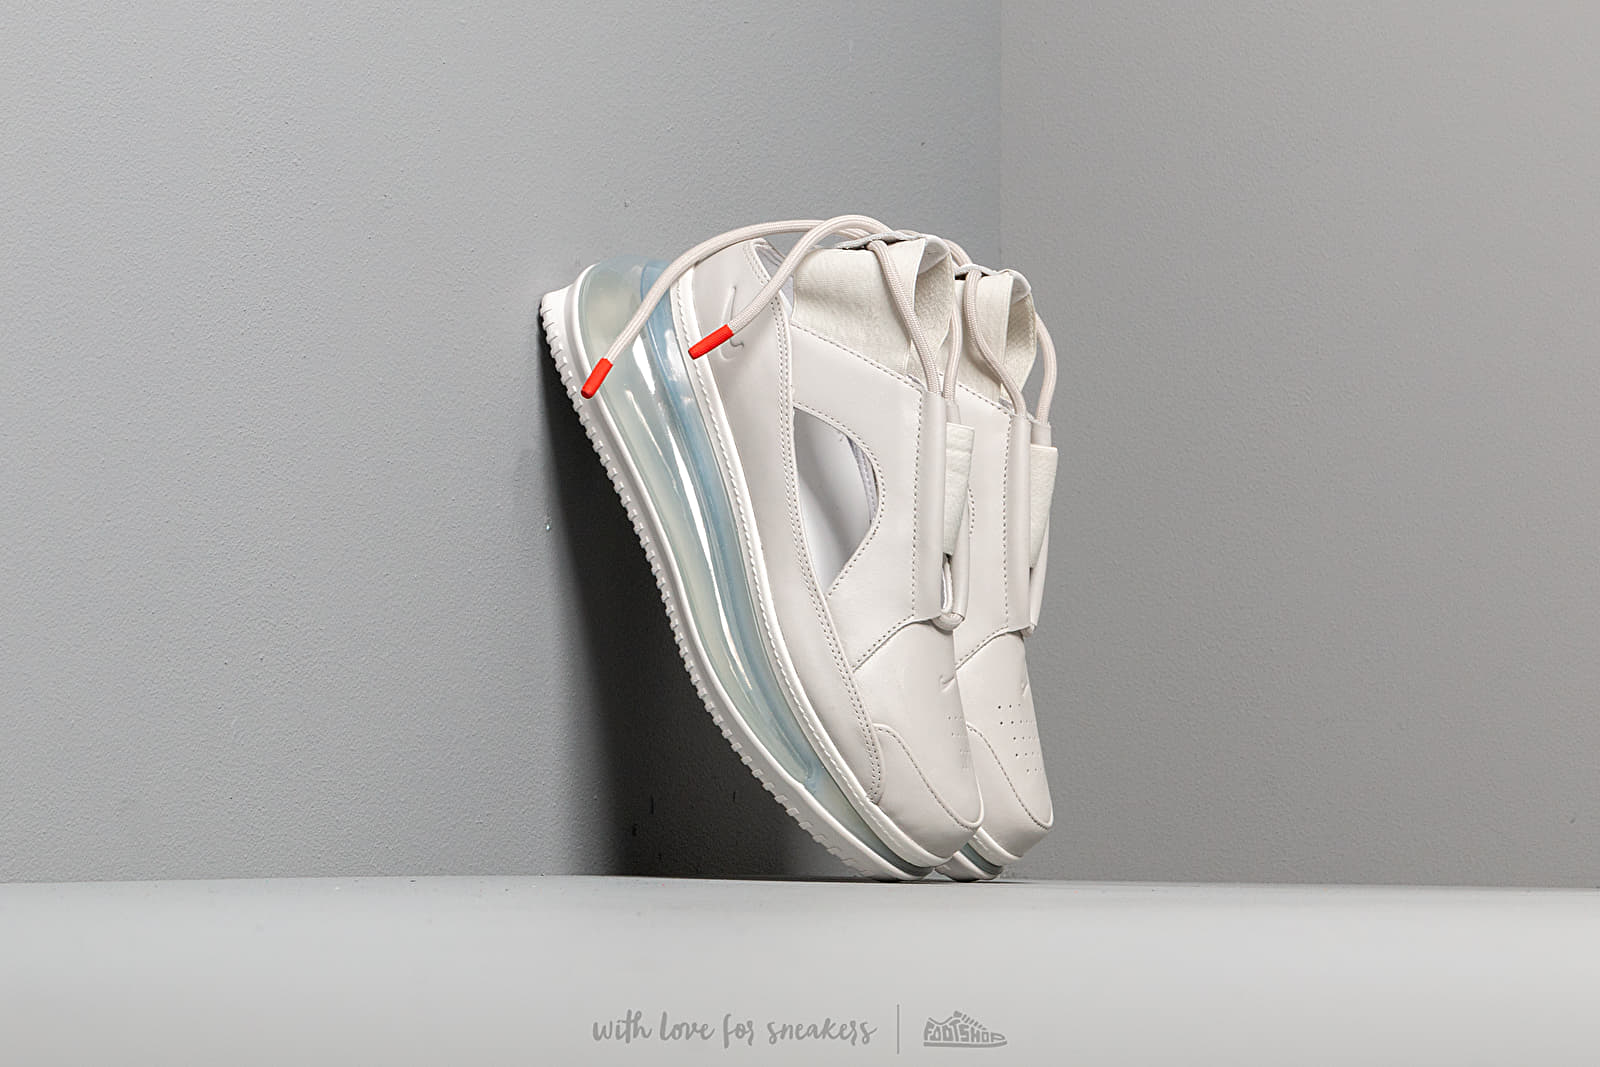 Nike W Air Max FF 720 Summit White/ Summit White-Light Bone za skvelú cenu 209 € kúpite na Footshop.sk